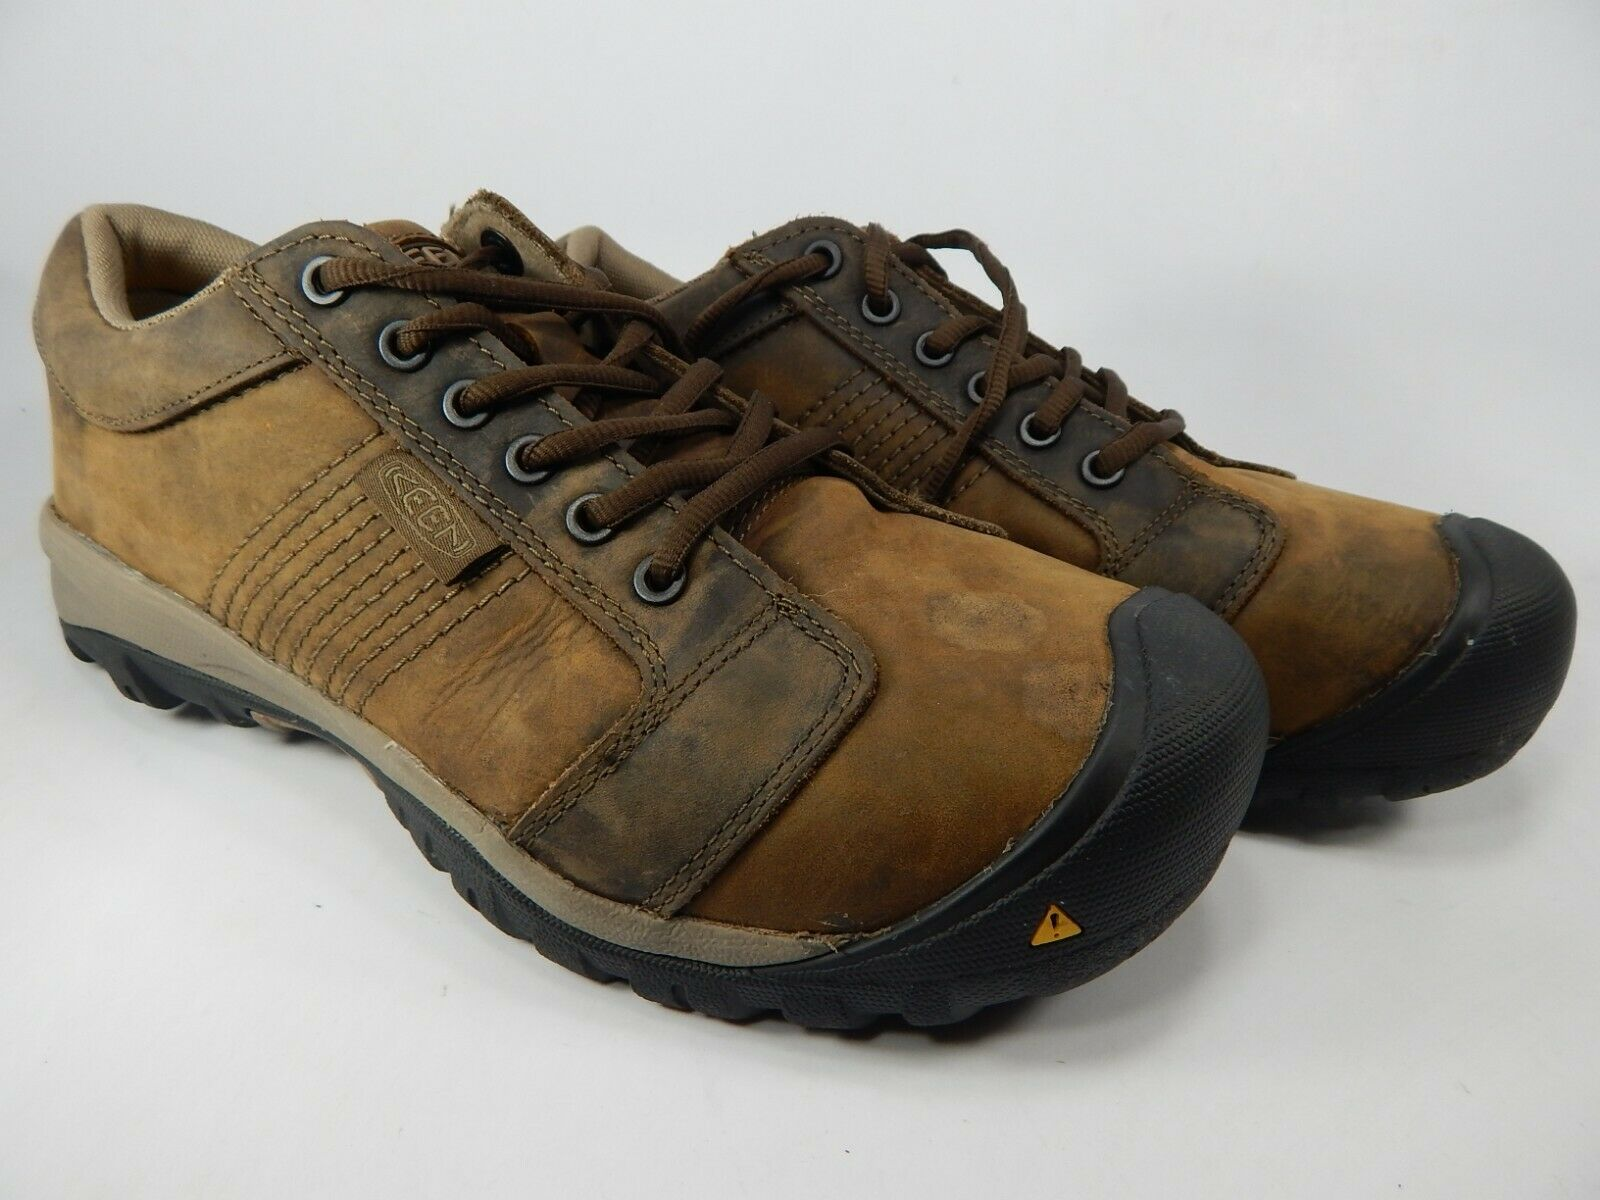 Keen La Conner ESD Dimensione 8.5 M (D) (D) (D) EU 41 Uomo WP Aluminum Toe Work scarpe 1017824 0b013c